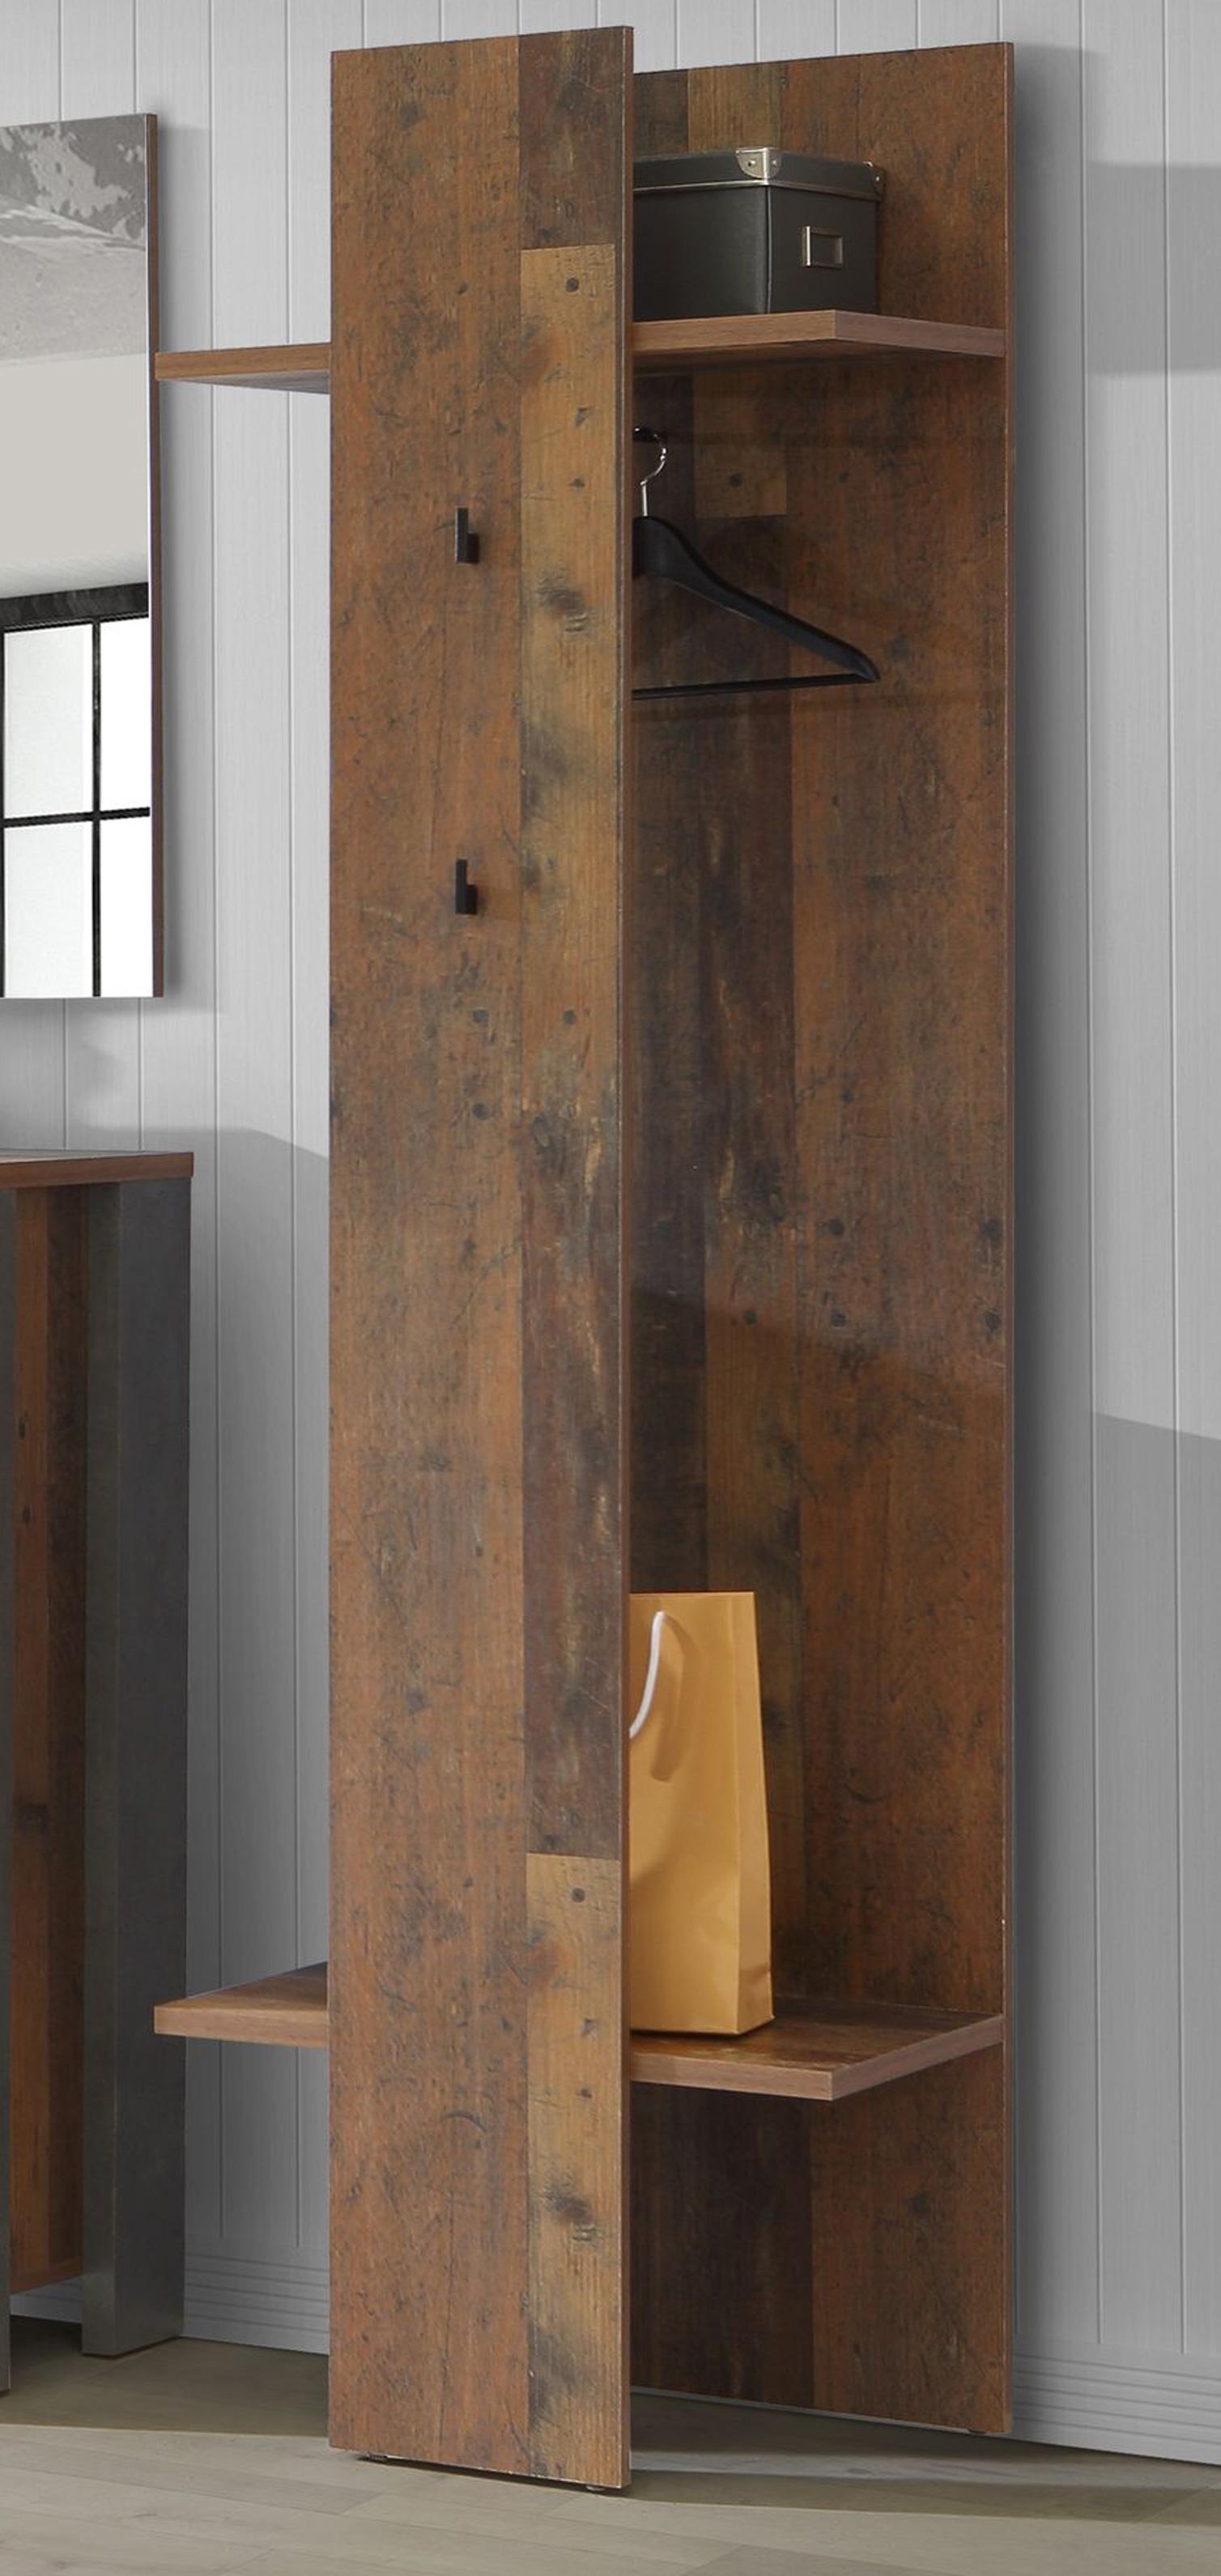 garderoben vintage elegant garderobe und spiegel vintage. Black Bedroom Furniture Sets. Home Design Ideas